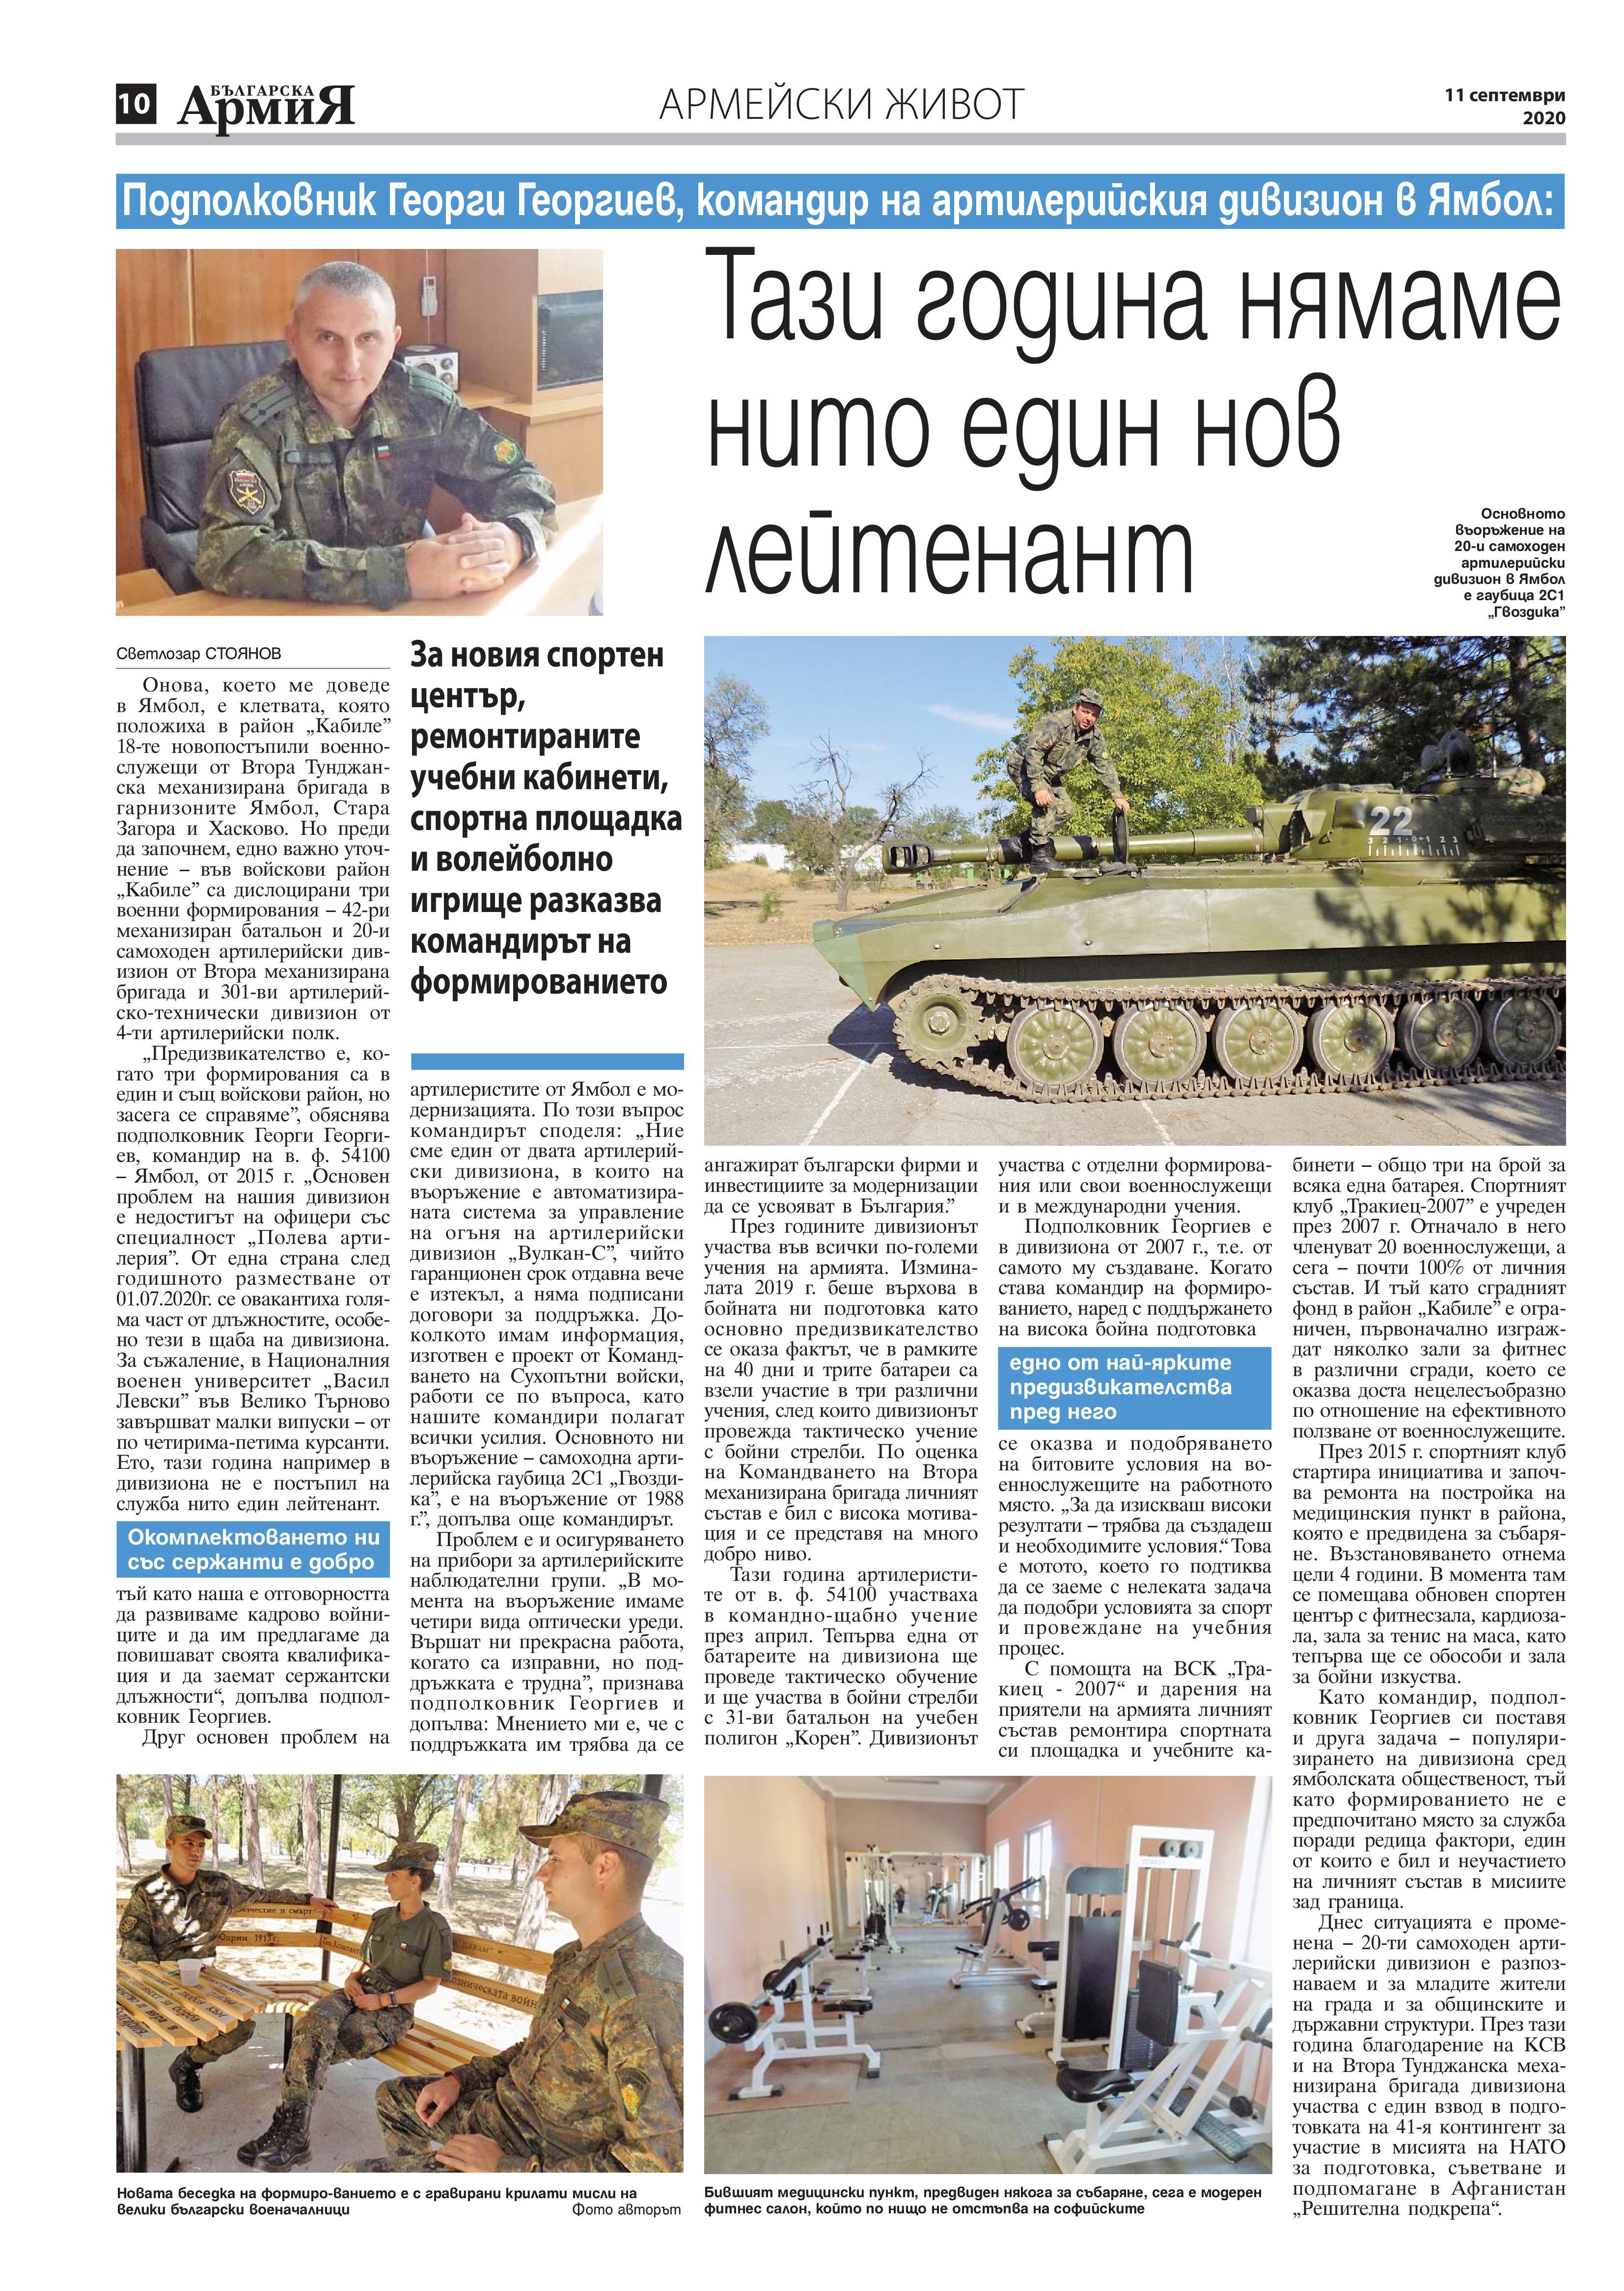 https://armymedia.bg/wp-content/uploads/2015/06/10-40.jpg